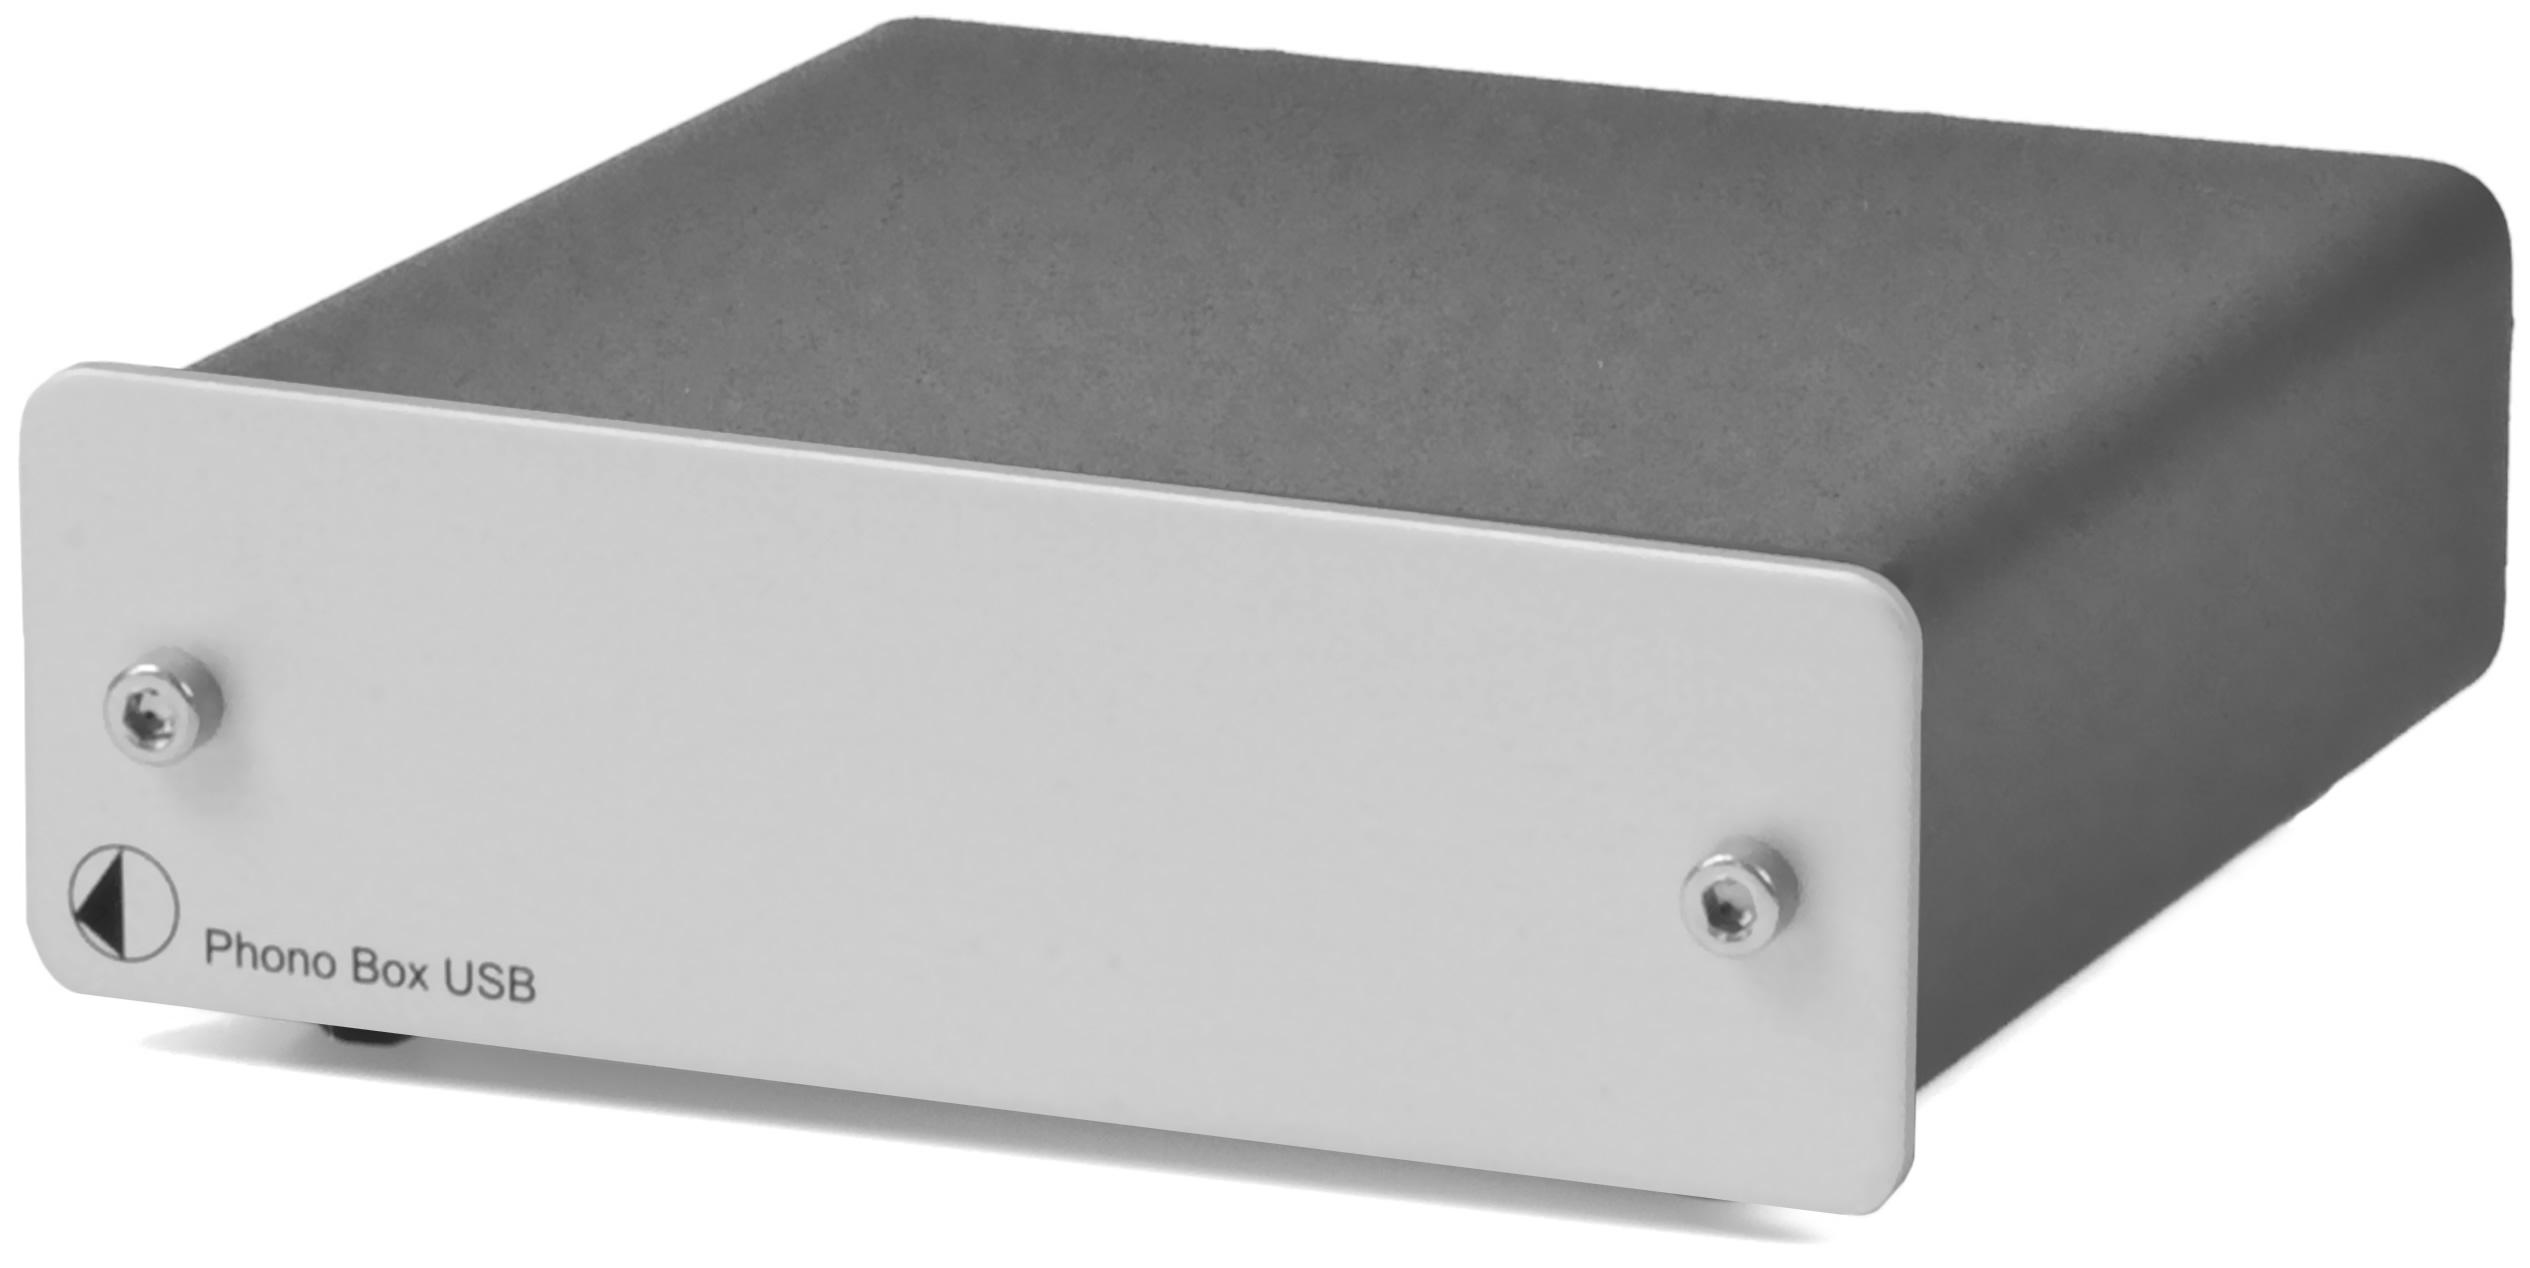 Pro-Ject Phono Box USB RIAA esivahvistin levysoittimelle